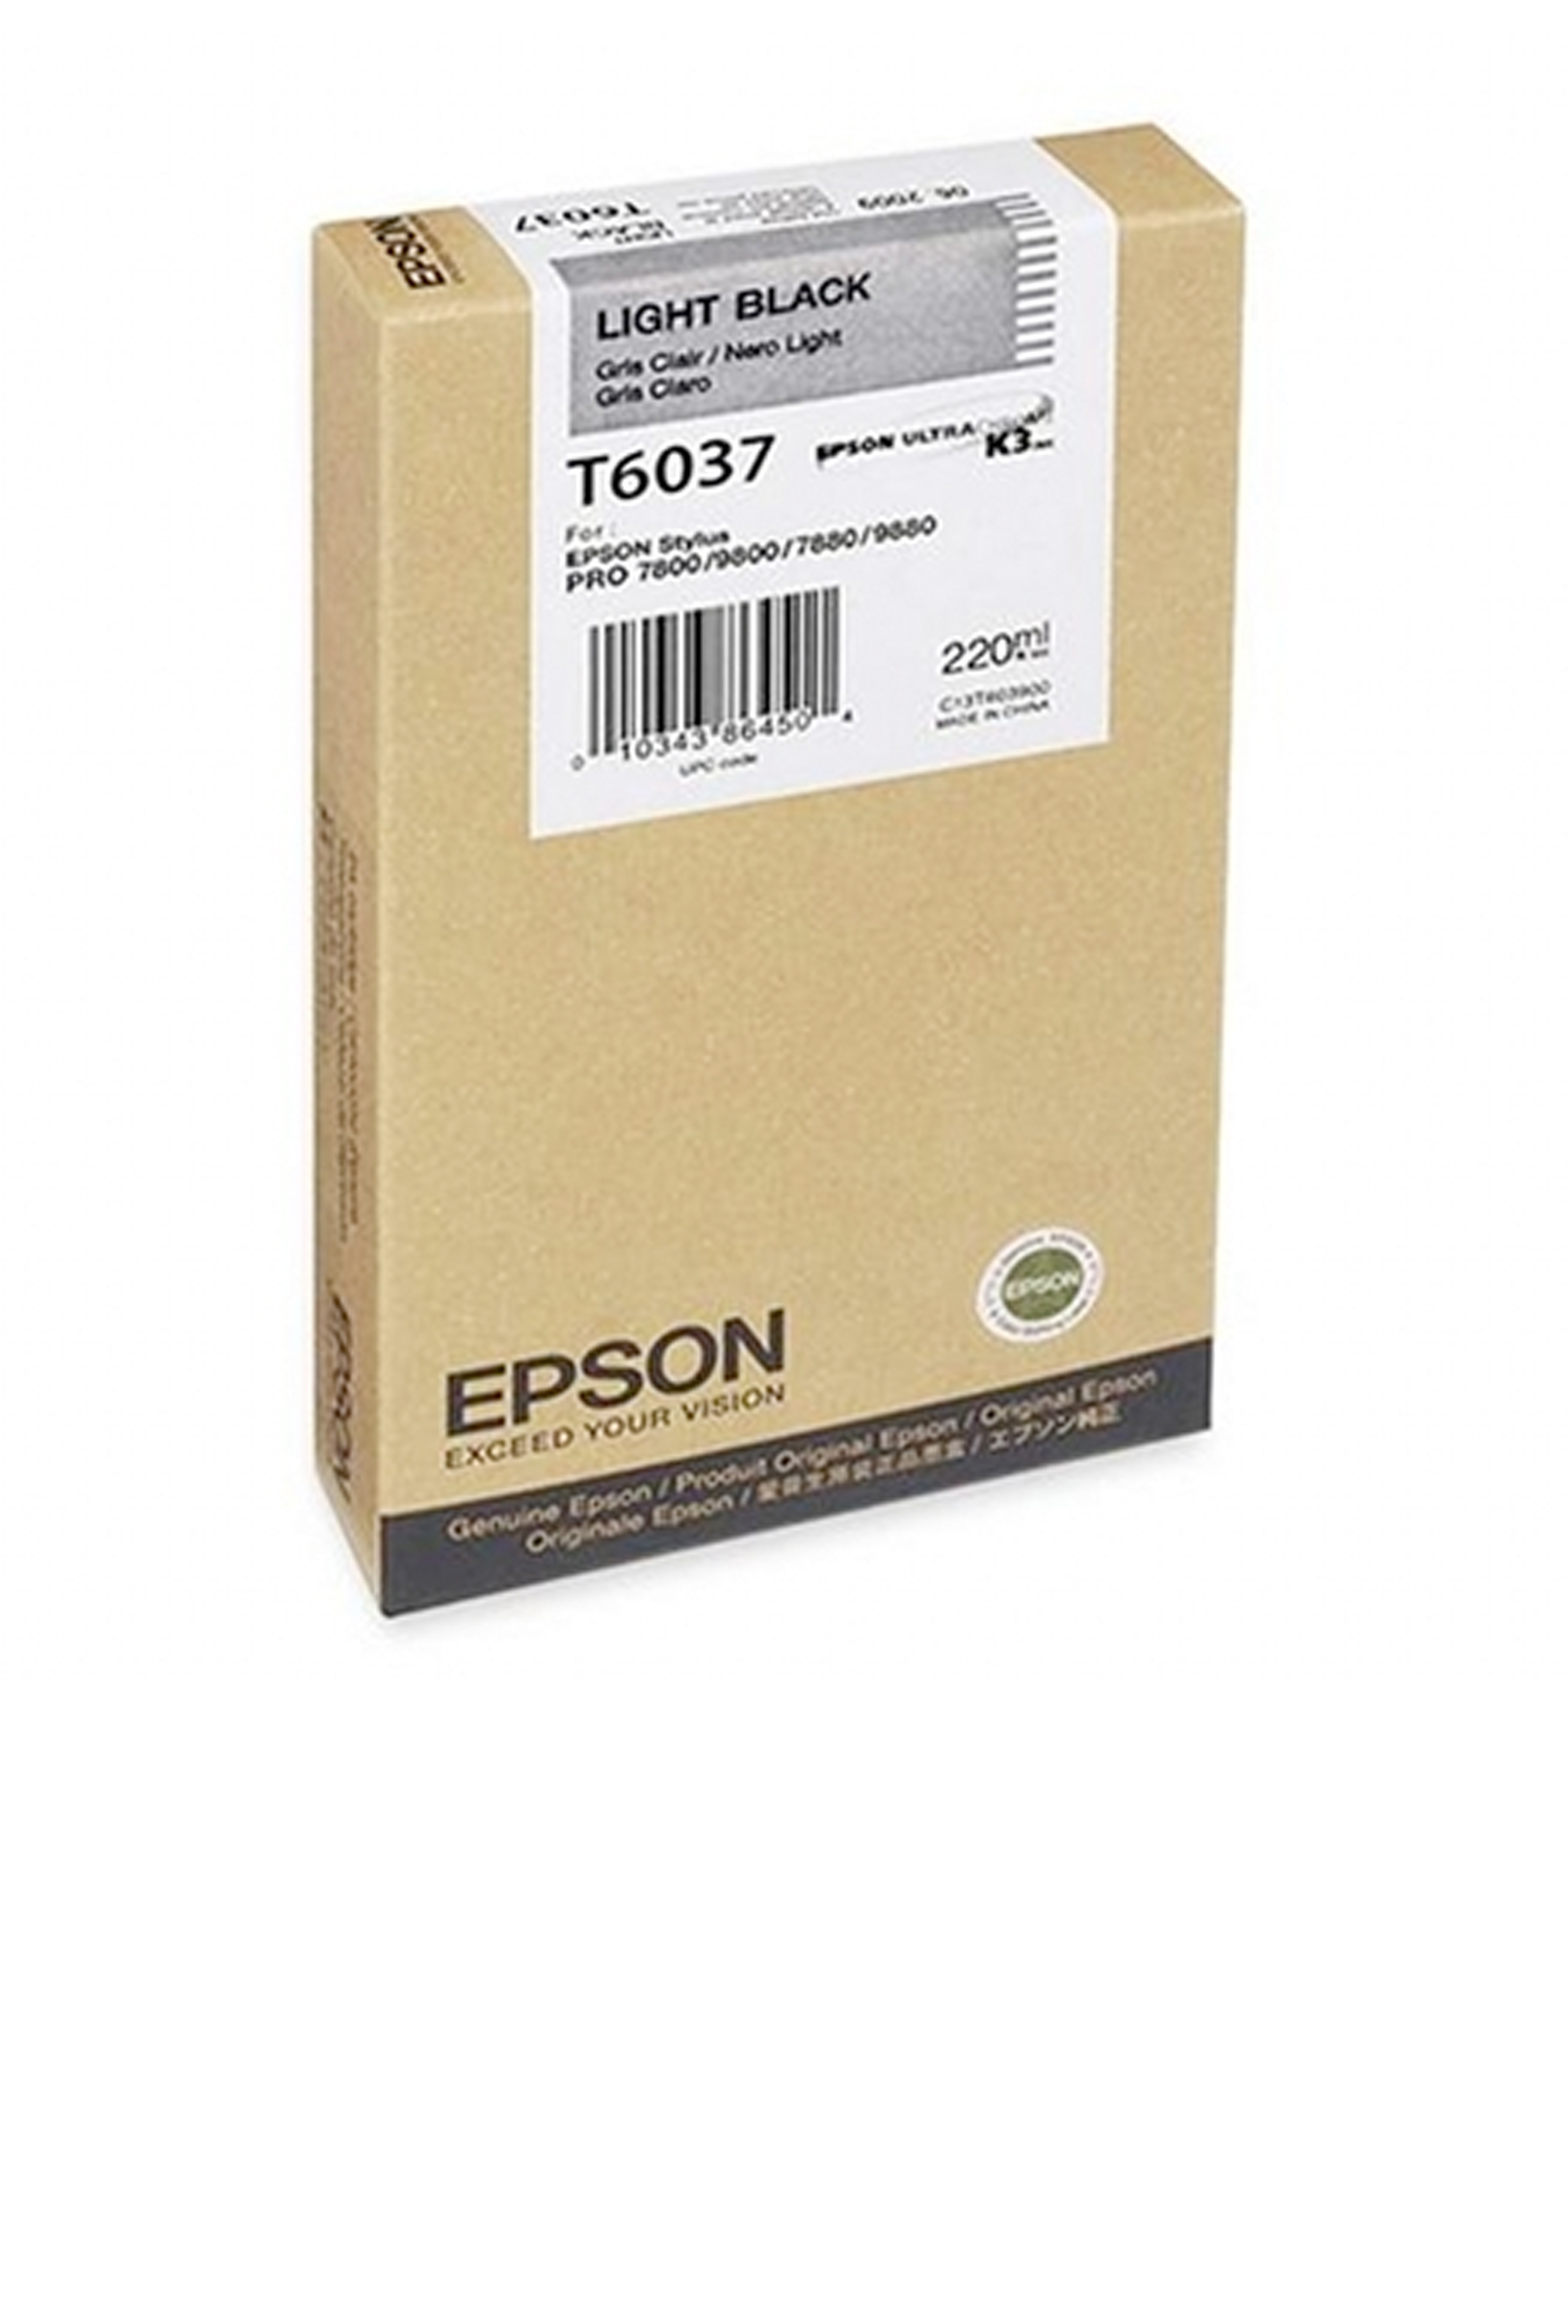 Epson EPSON SD LT BLACK INK (220 ML) (T603700)